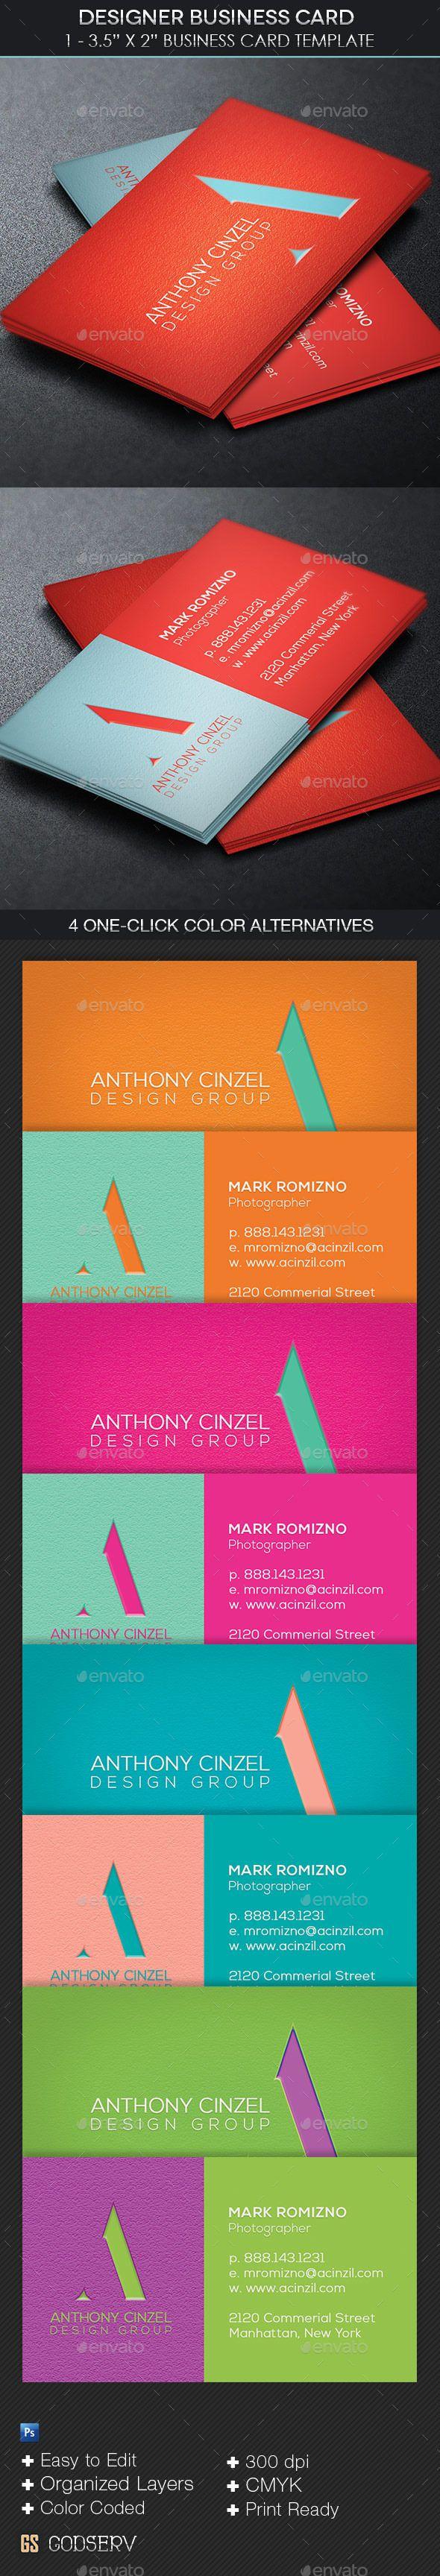 designer business card template